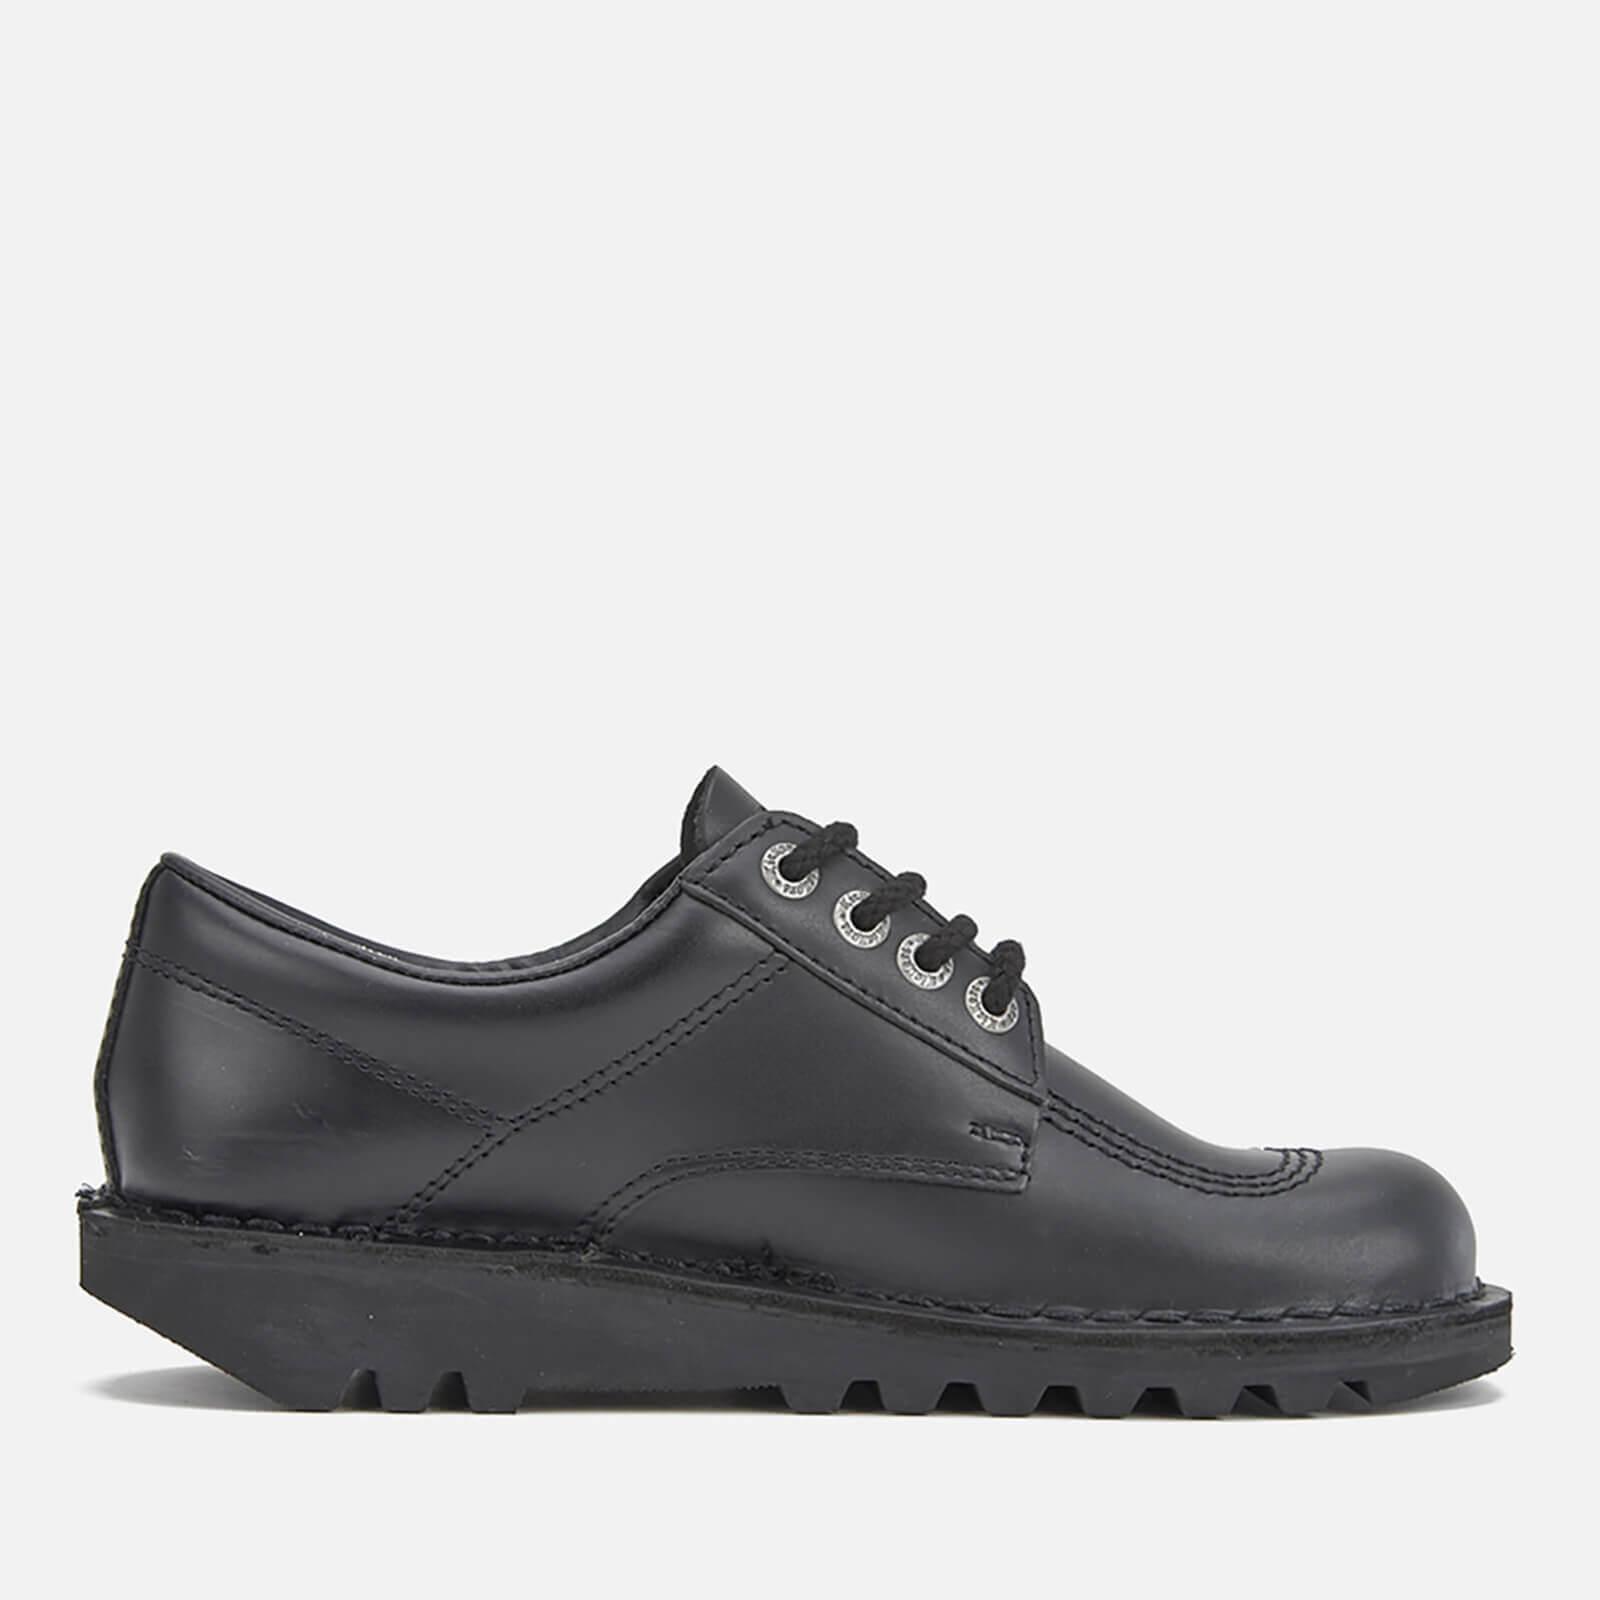 abc93febad Kickers Women's Kick Lo Lace Up Shoes - Black Womens Footwear | Zavvi